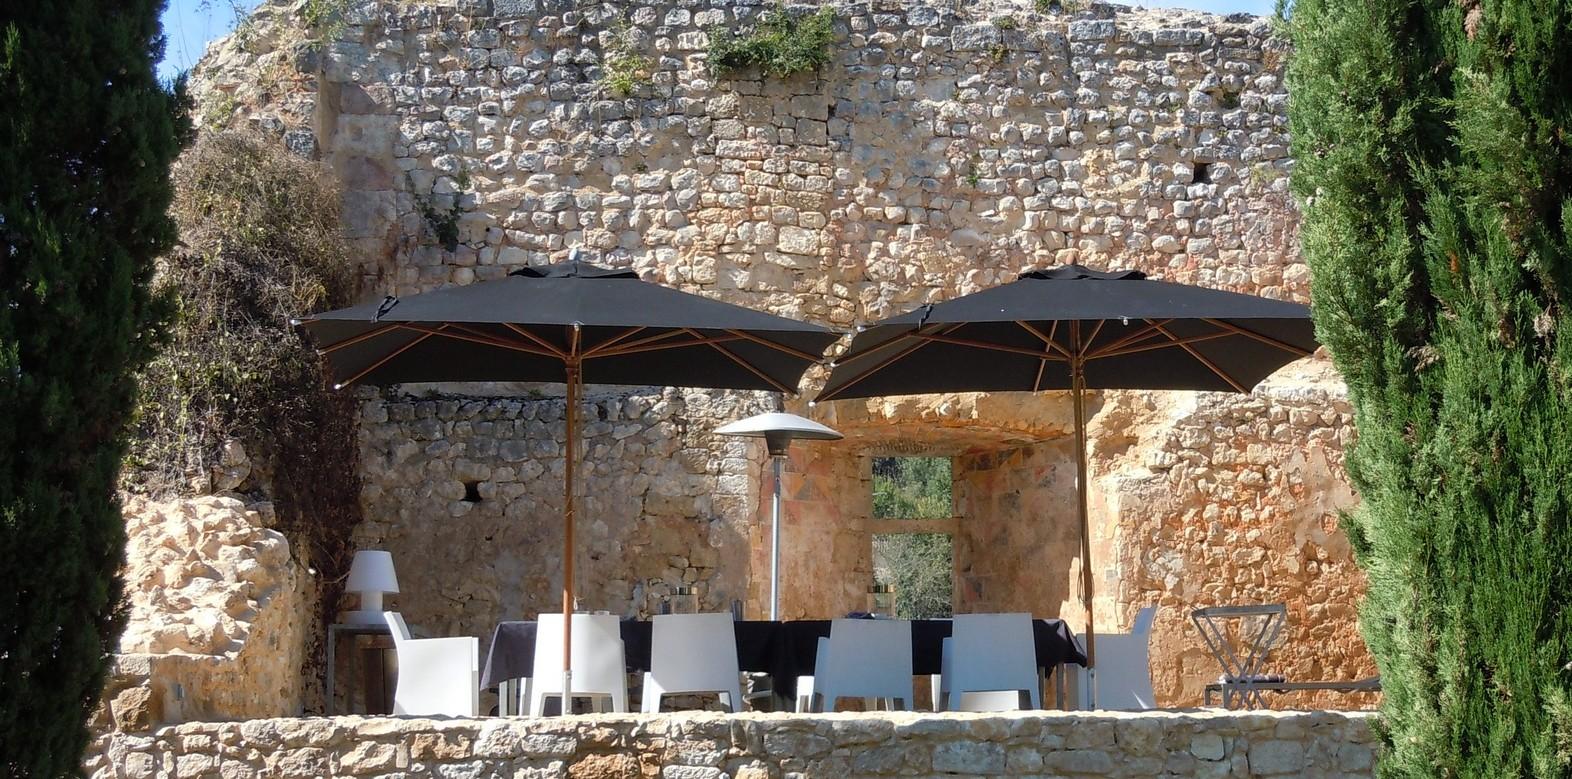 dordogne property for sale by owner - Castle Clerans Bergerac